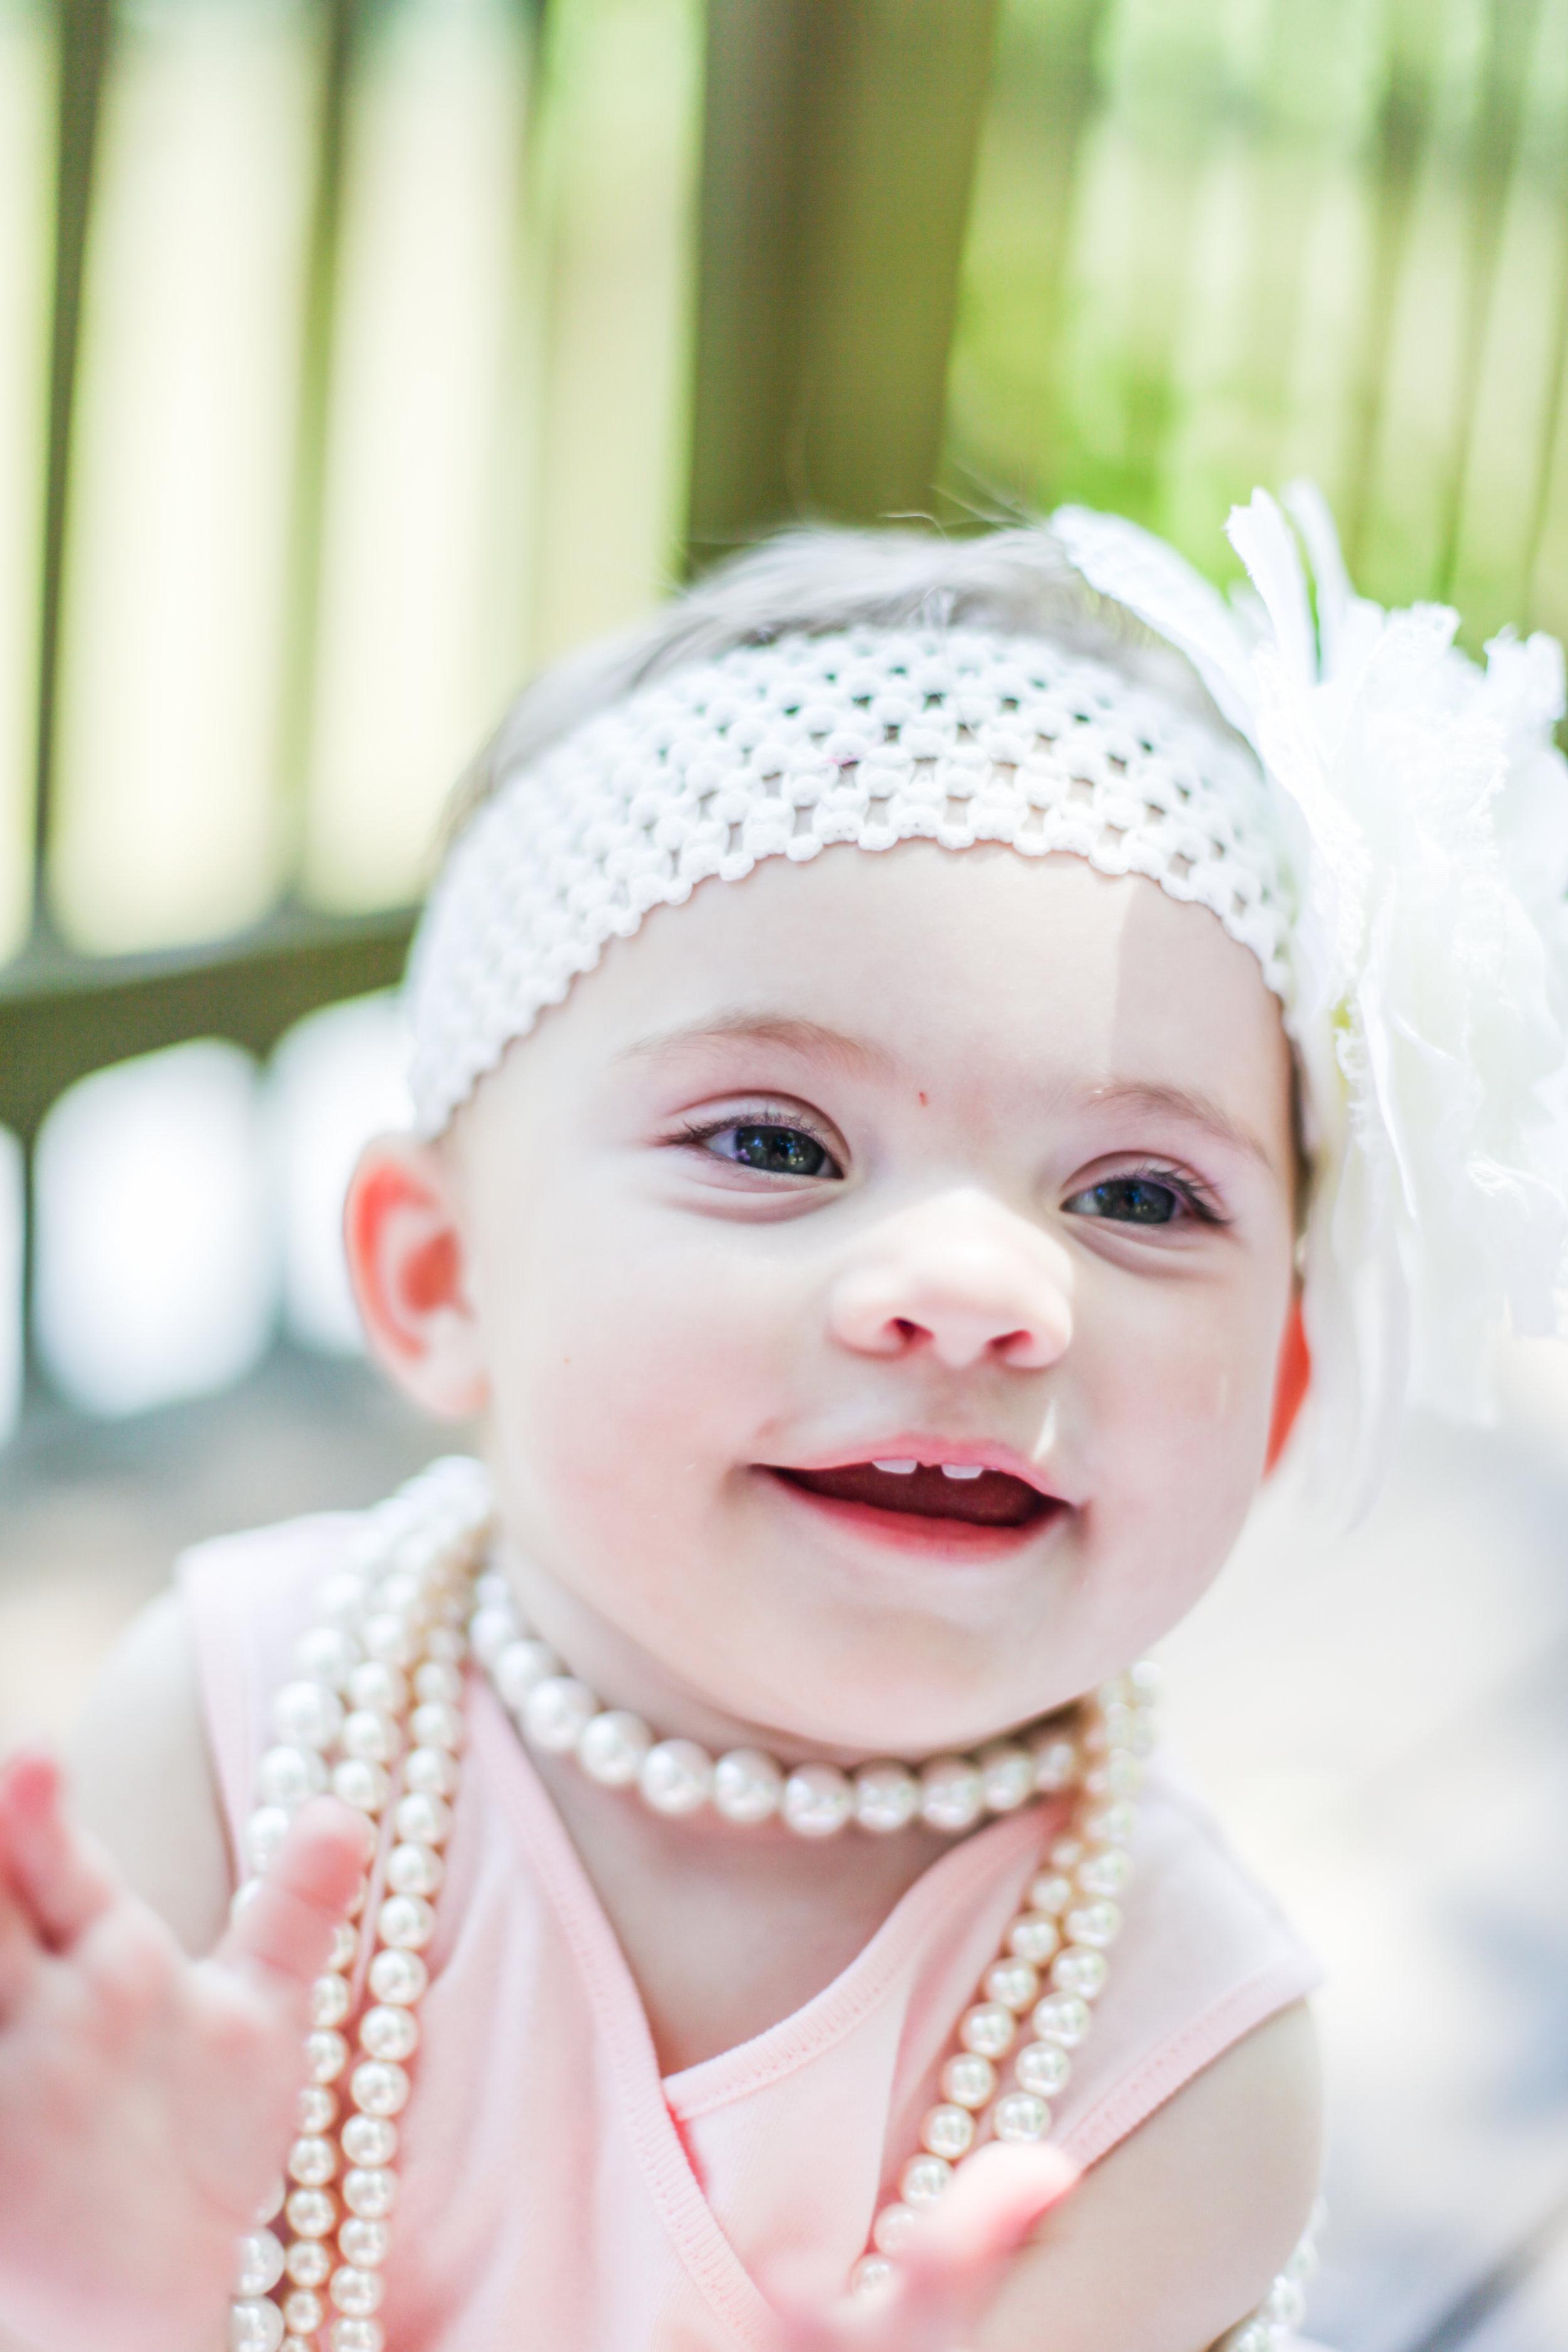 woodstock baby photography angela elliott-37.jpg